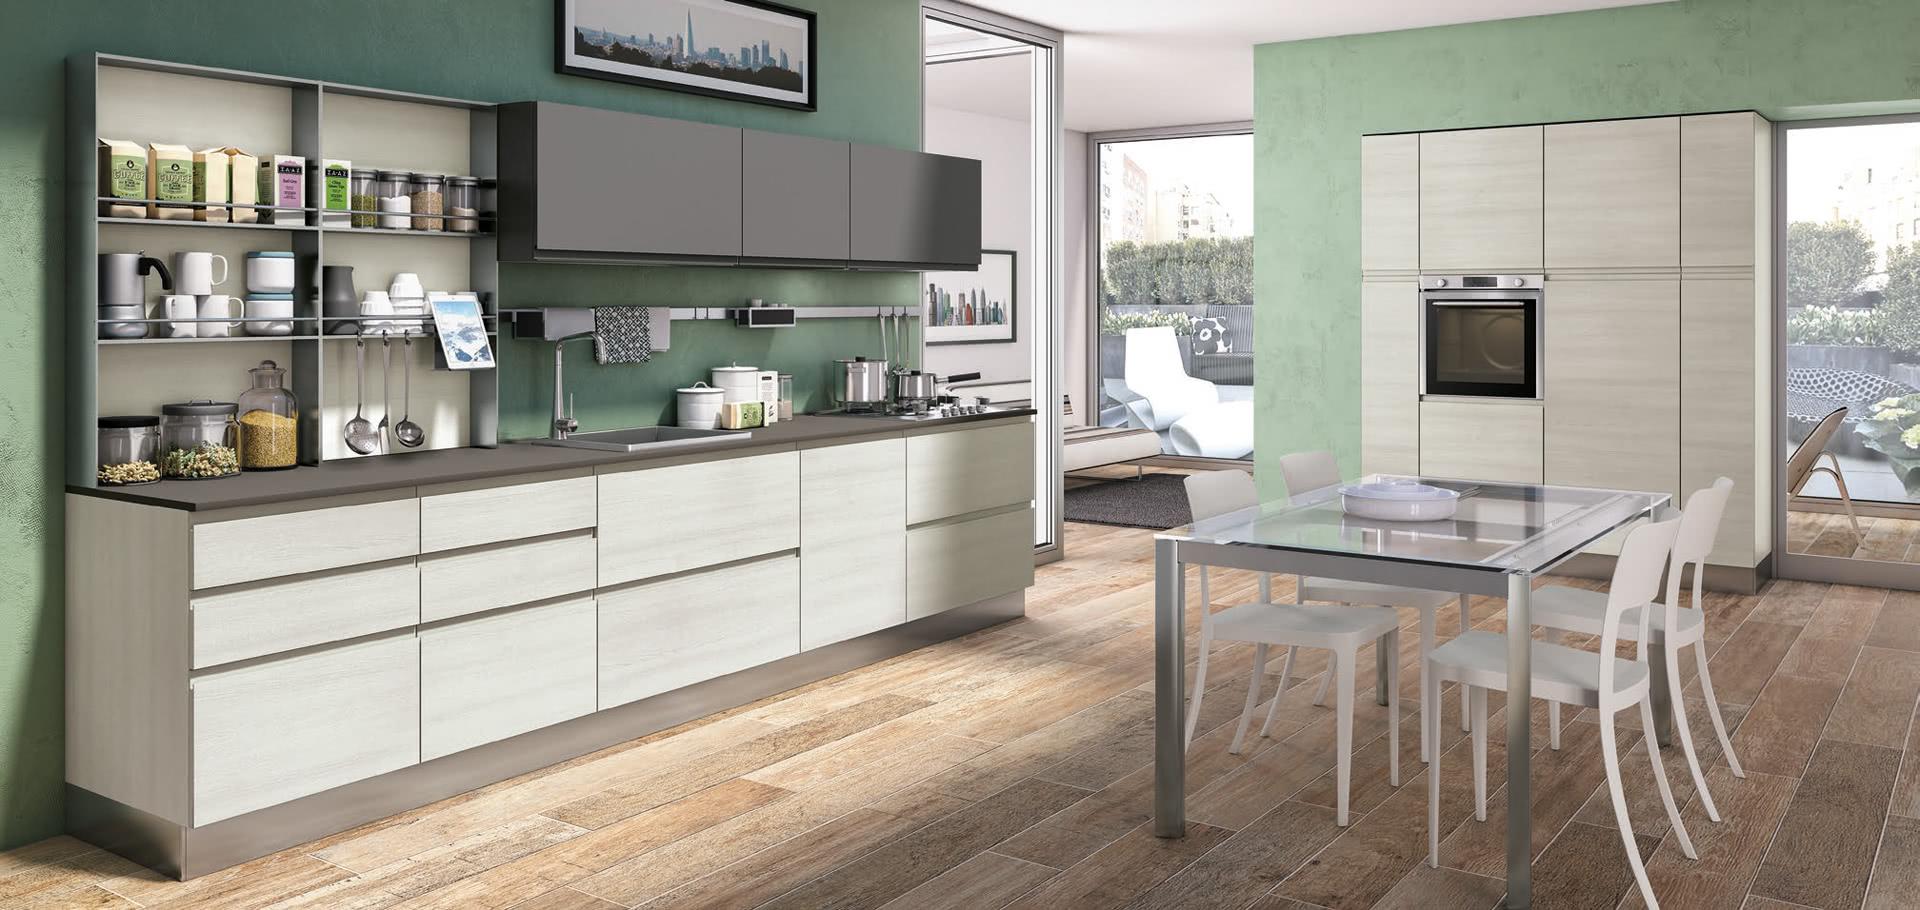 Cucina moderna jey jey creo kitchens - Cucina creo jey prezzi ...